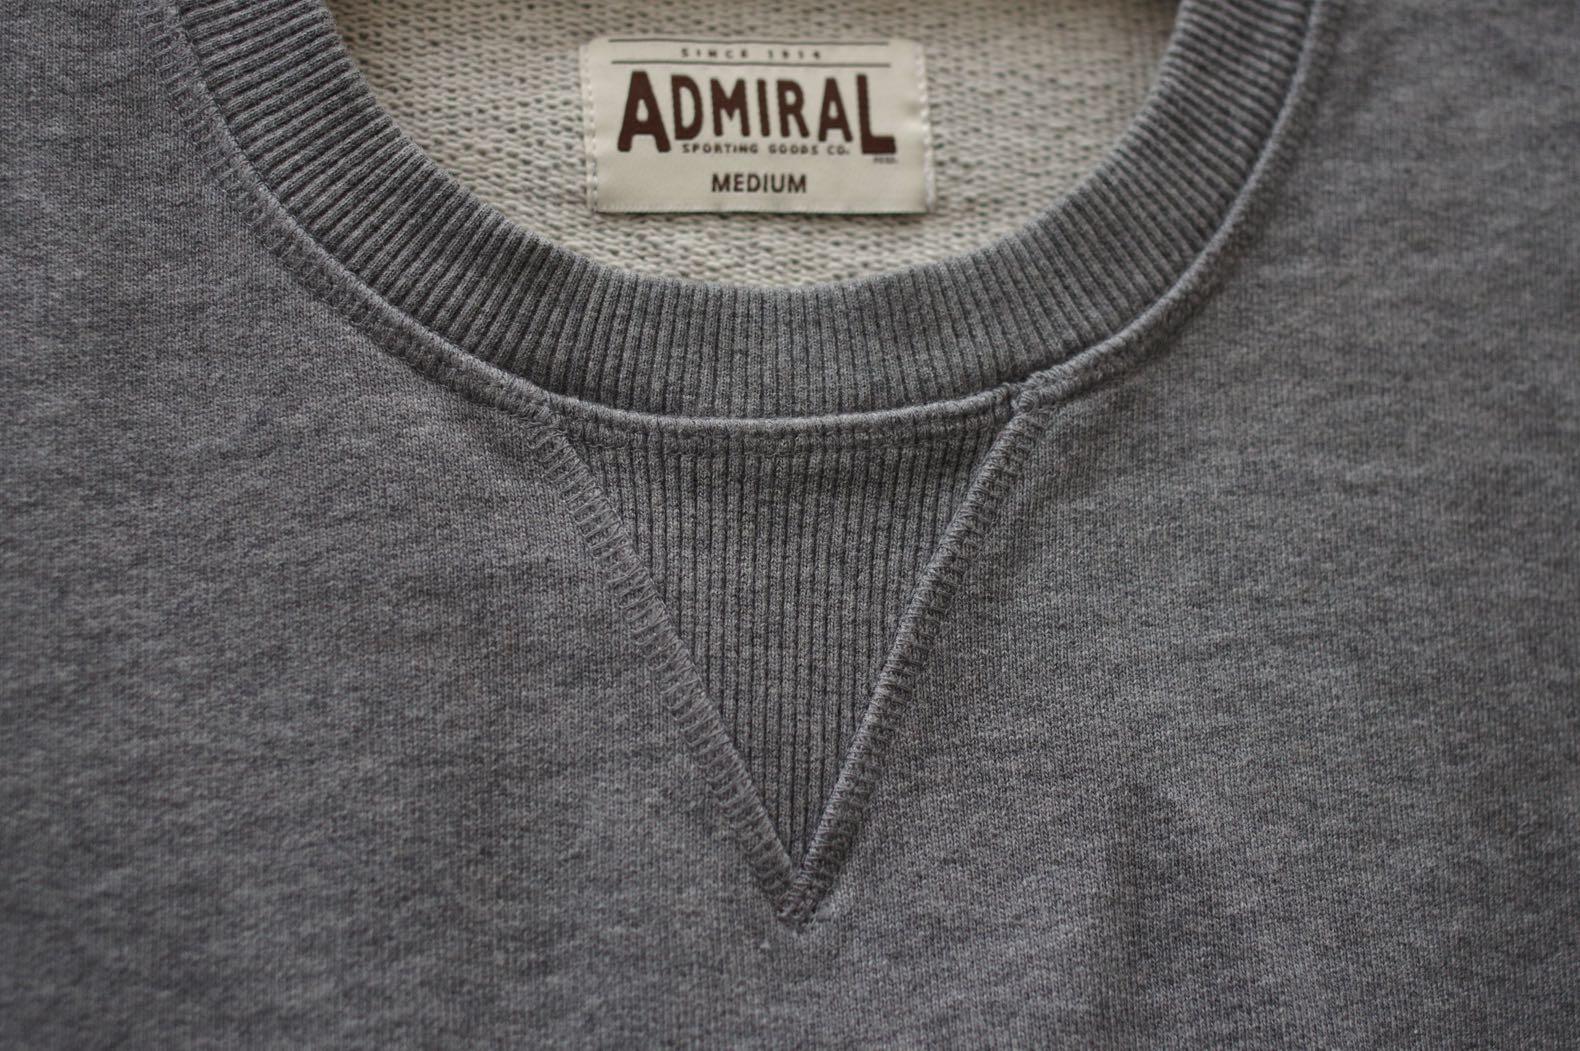 sweat gris esprit vintage sport militaire admiral